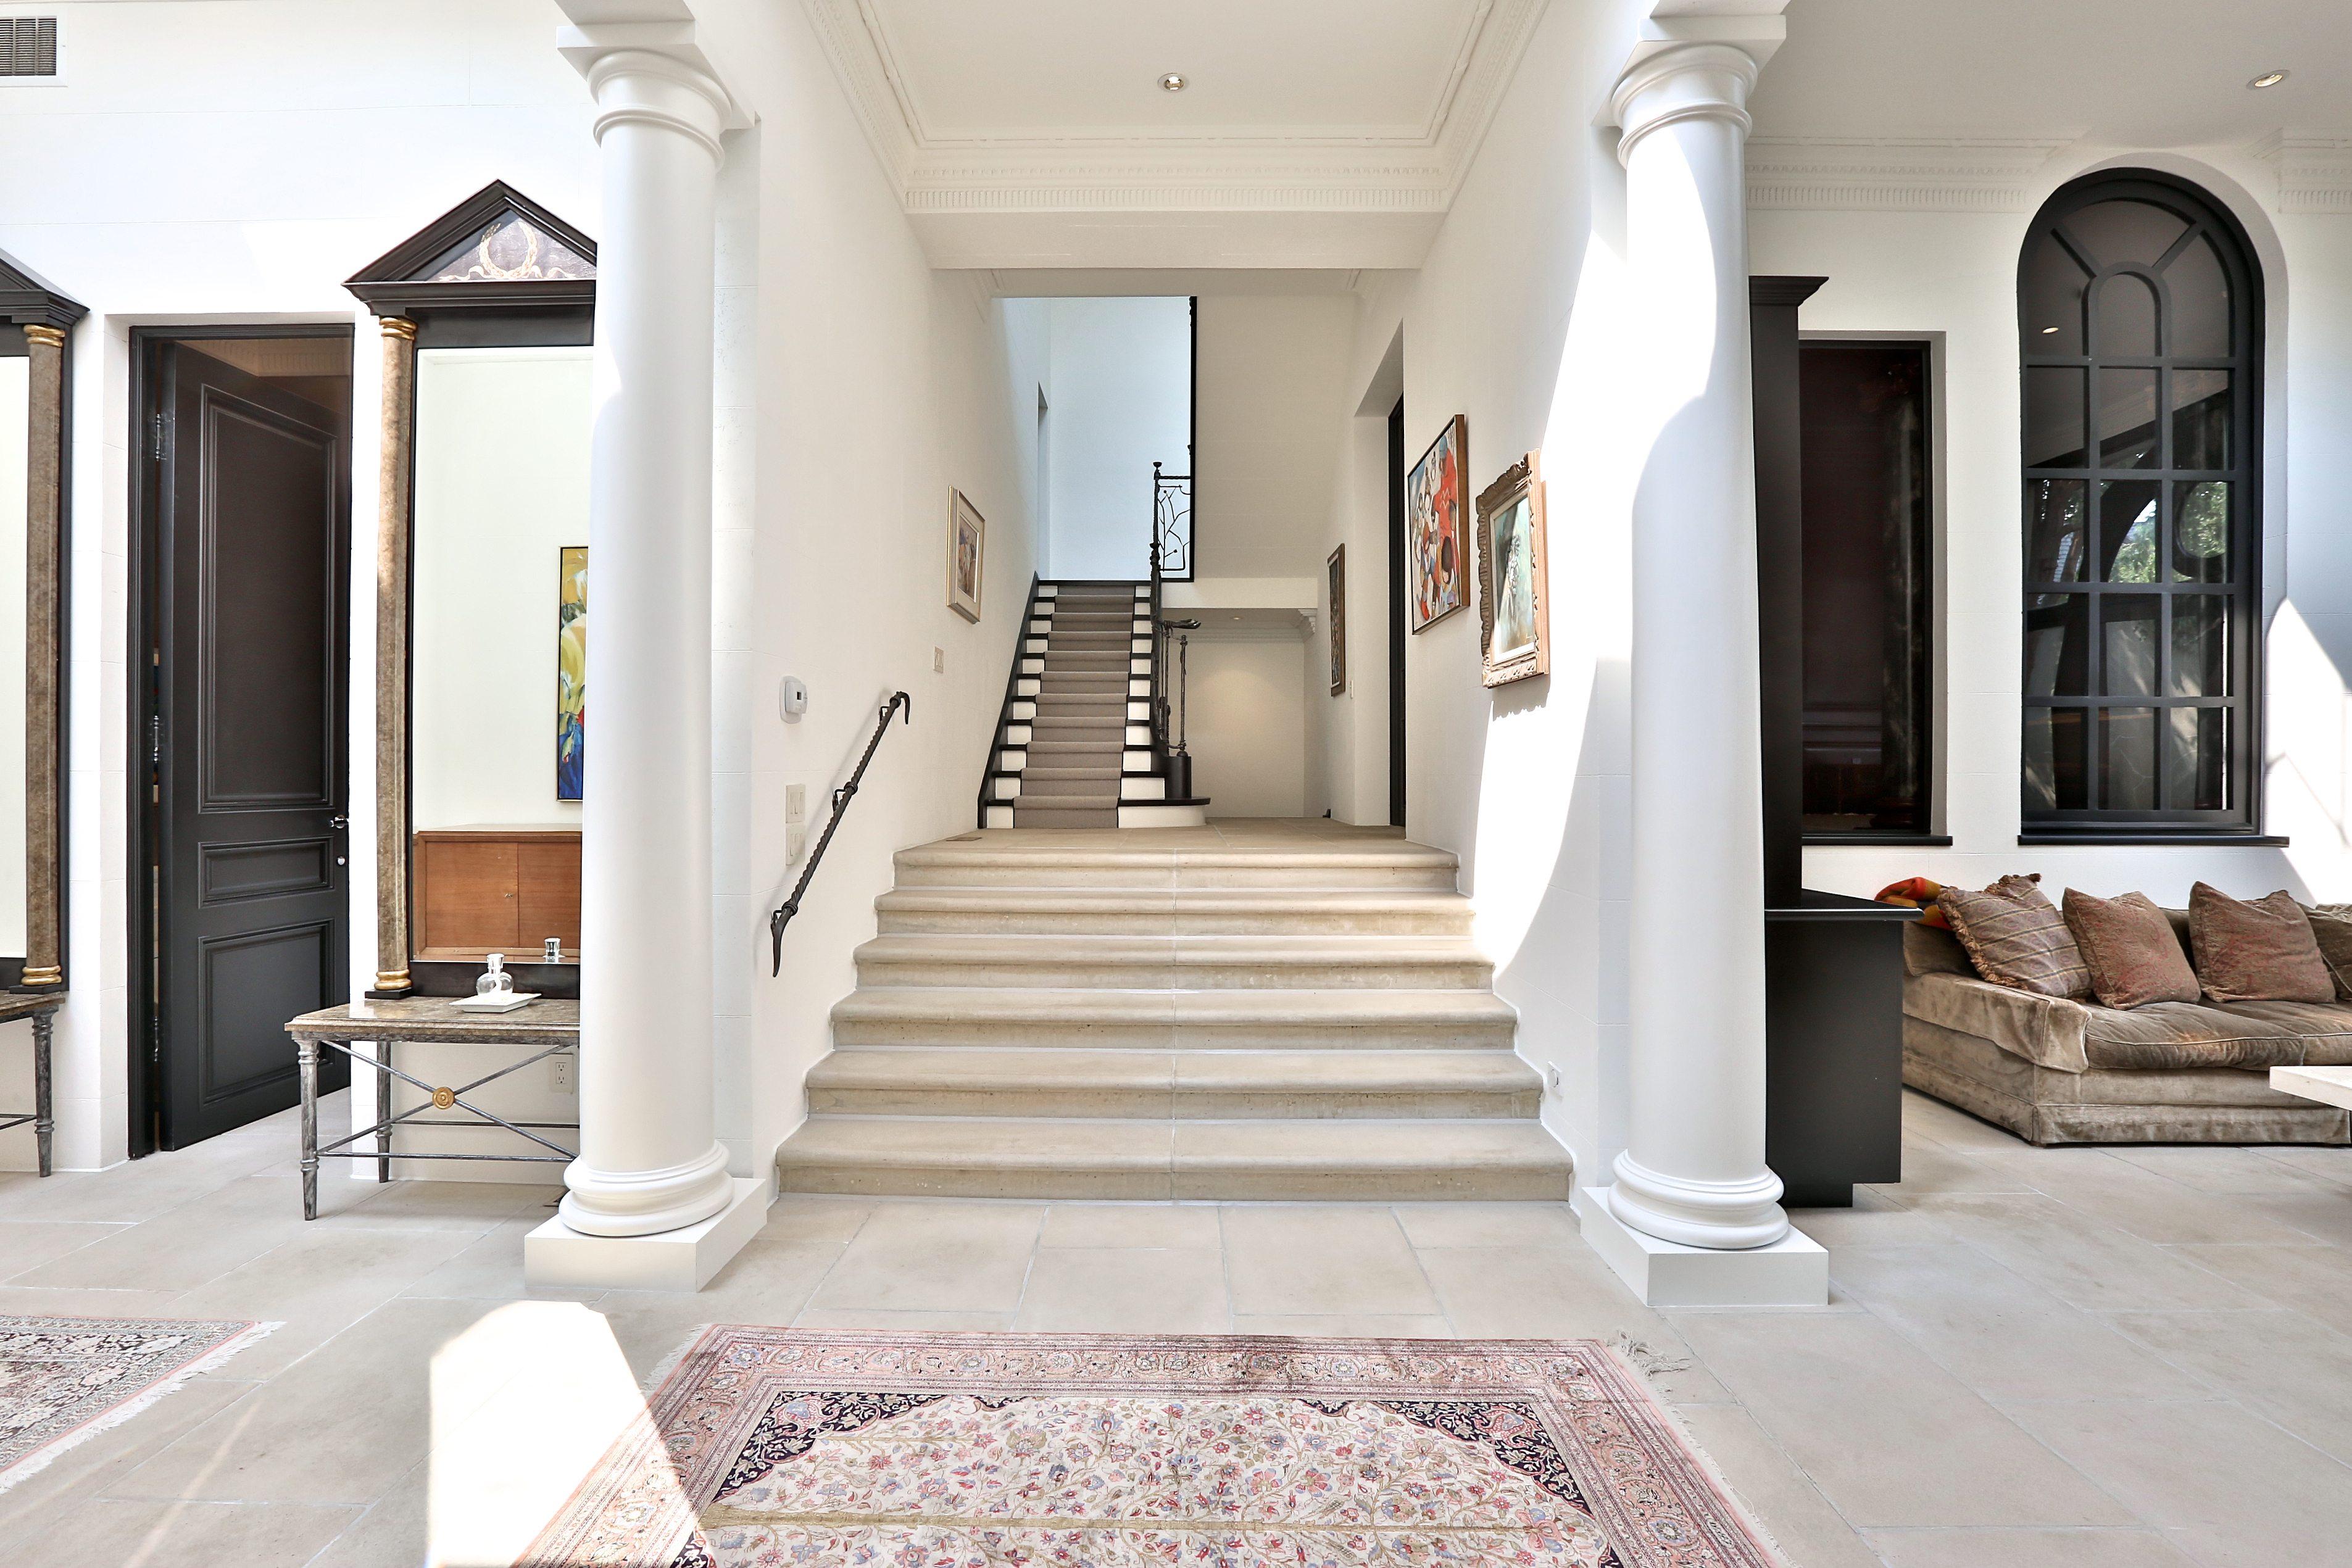 toronto-house-for-sale-7-sherwood-lane-10